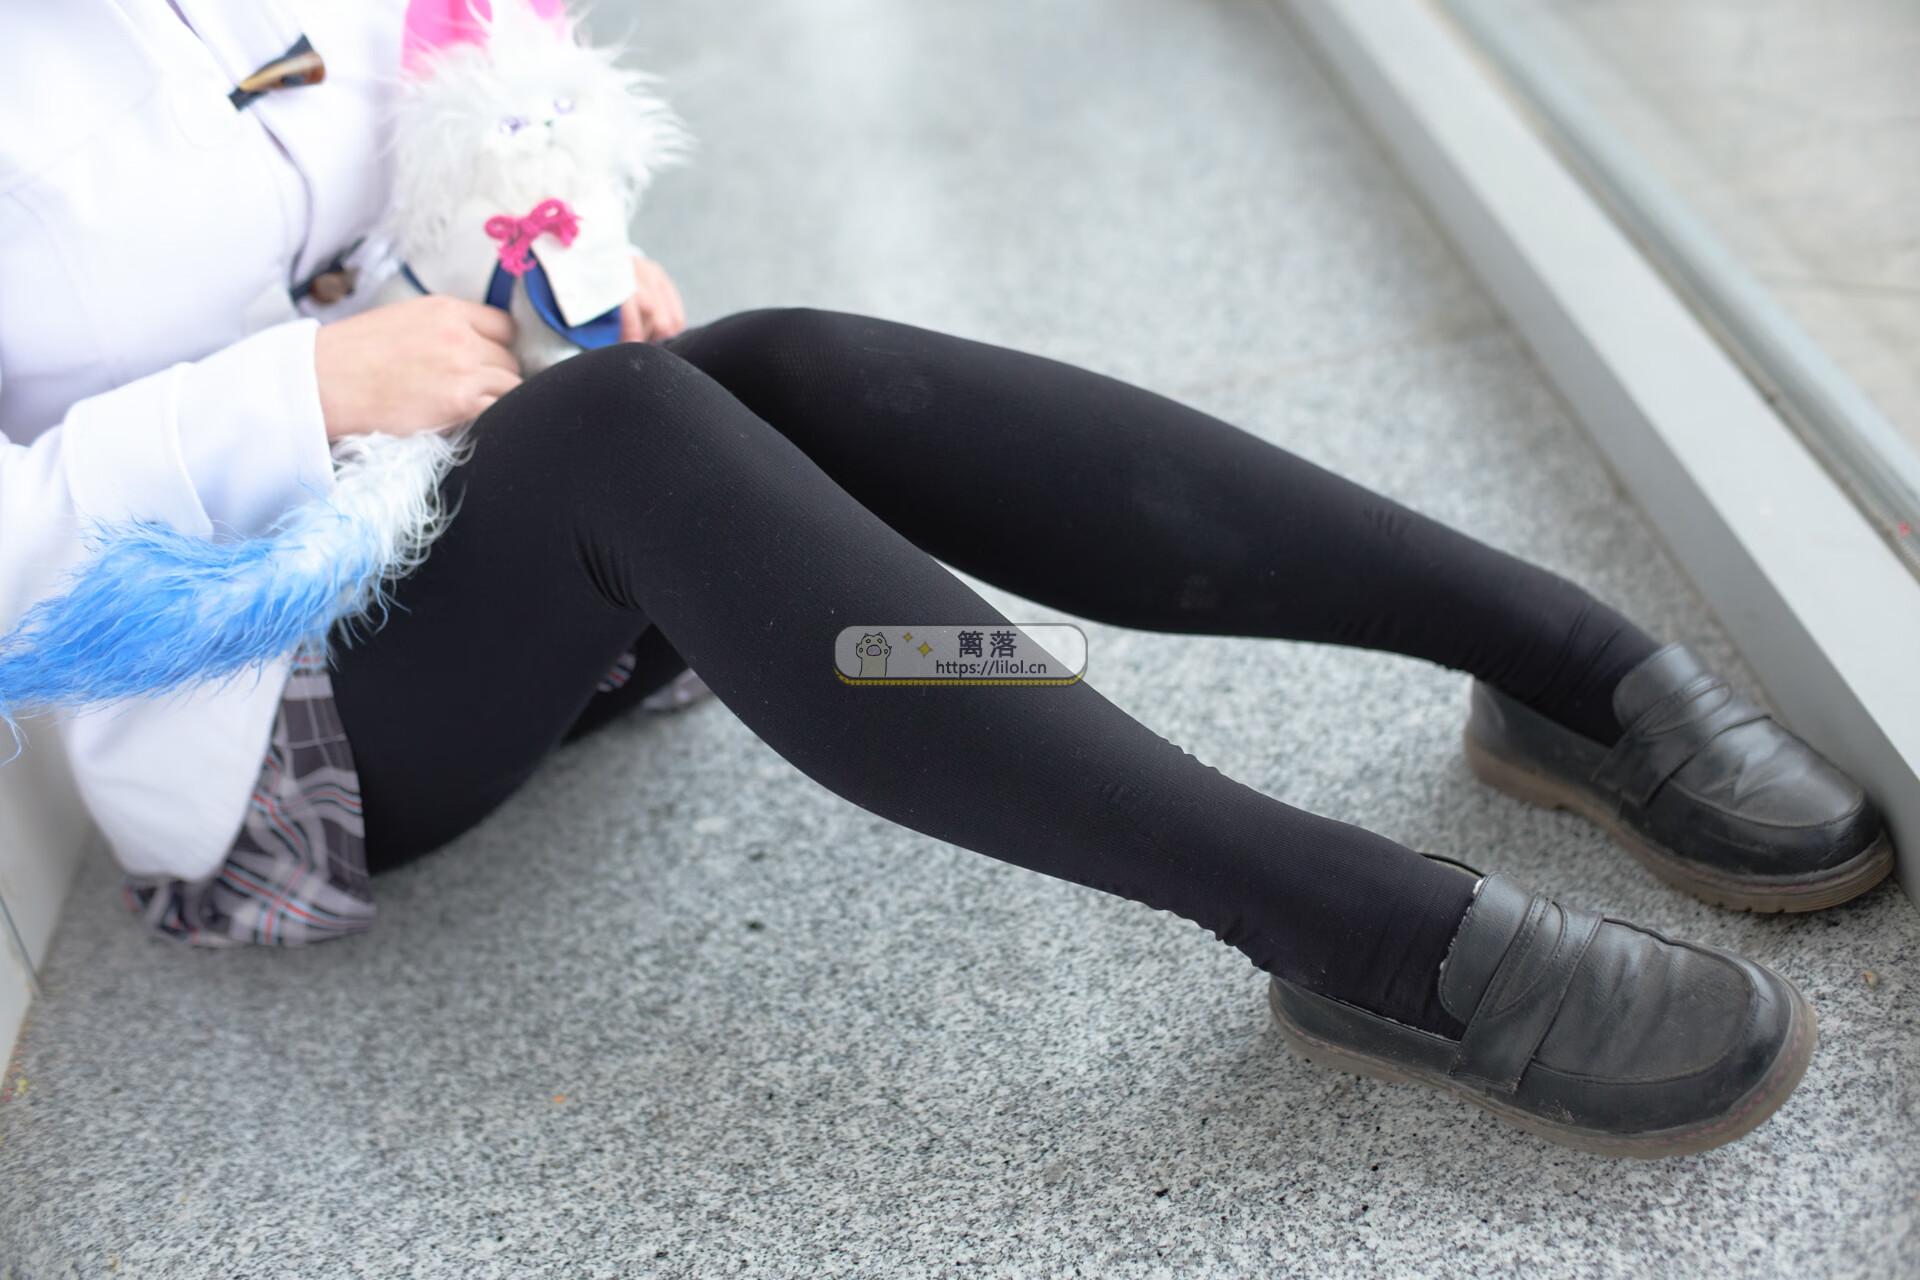 【FREE系列】森萝财团写真 FREE-007 白丝+黑丝短裙制服装室外写真 [83图-1视频-1.5GB] FREE系列 第5张